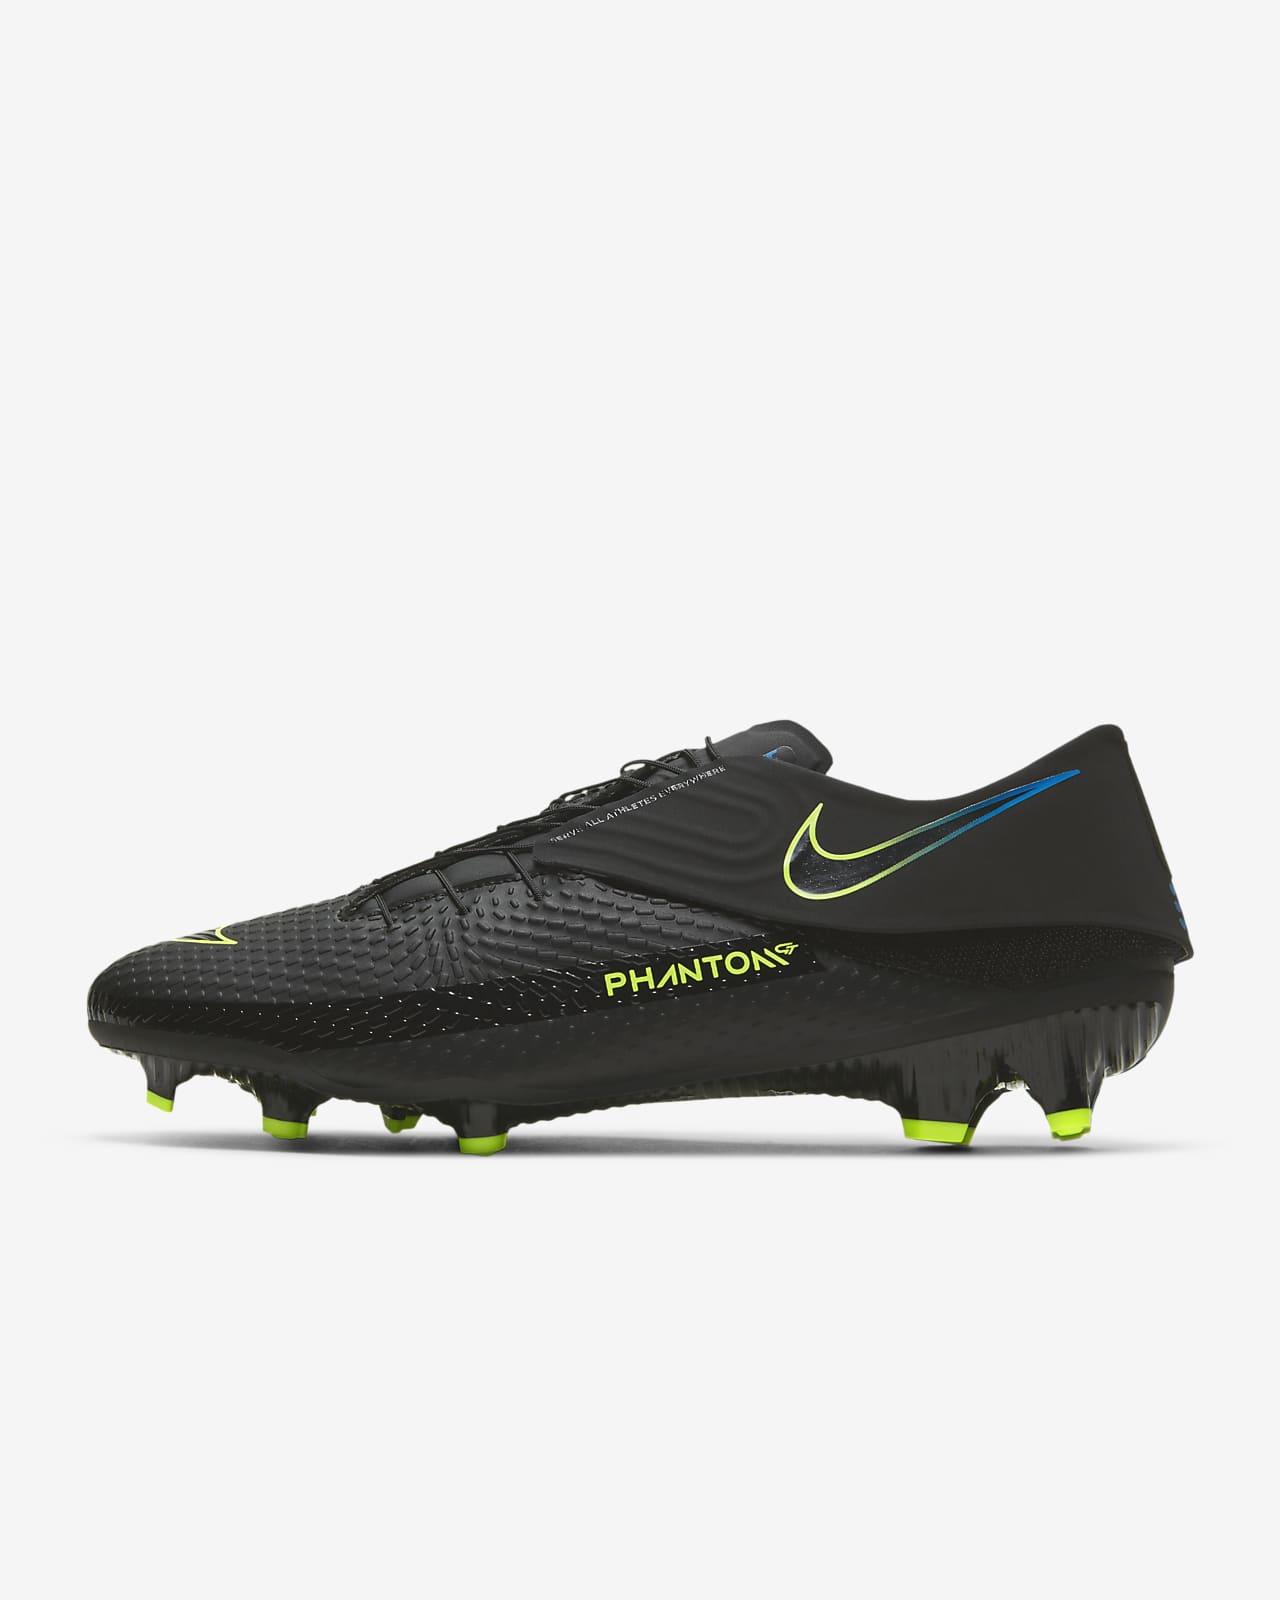 Nike Phantom GT Academy FlyEase MG Multi-Ground Football Boot